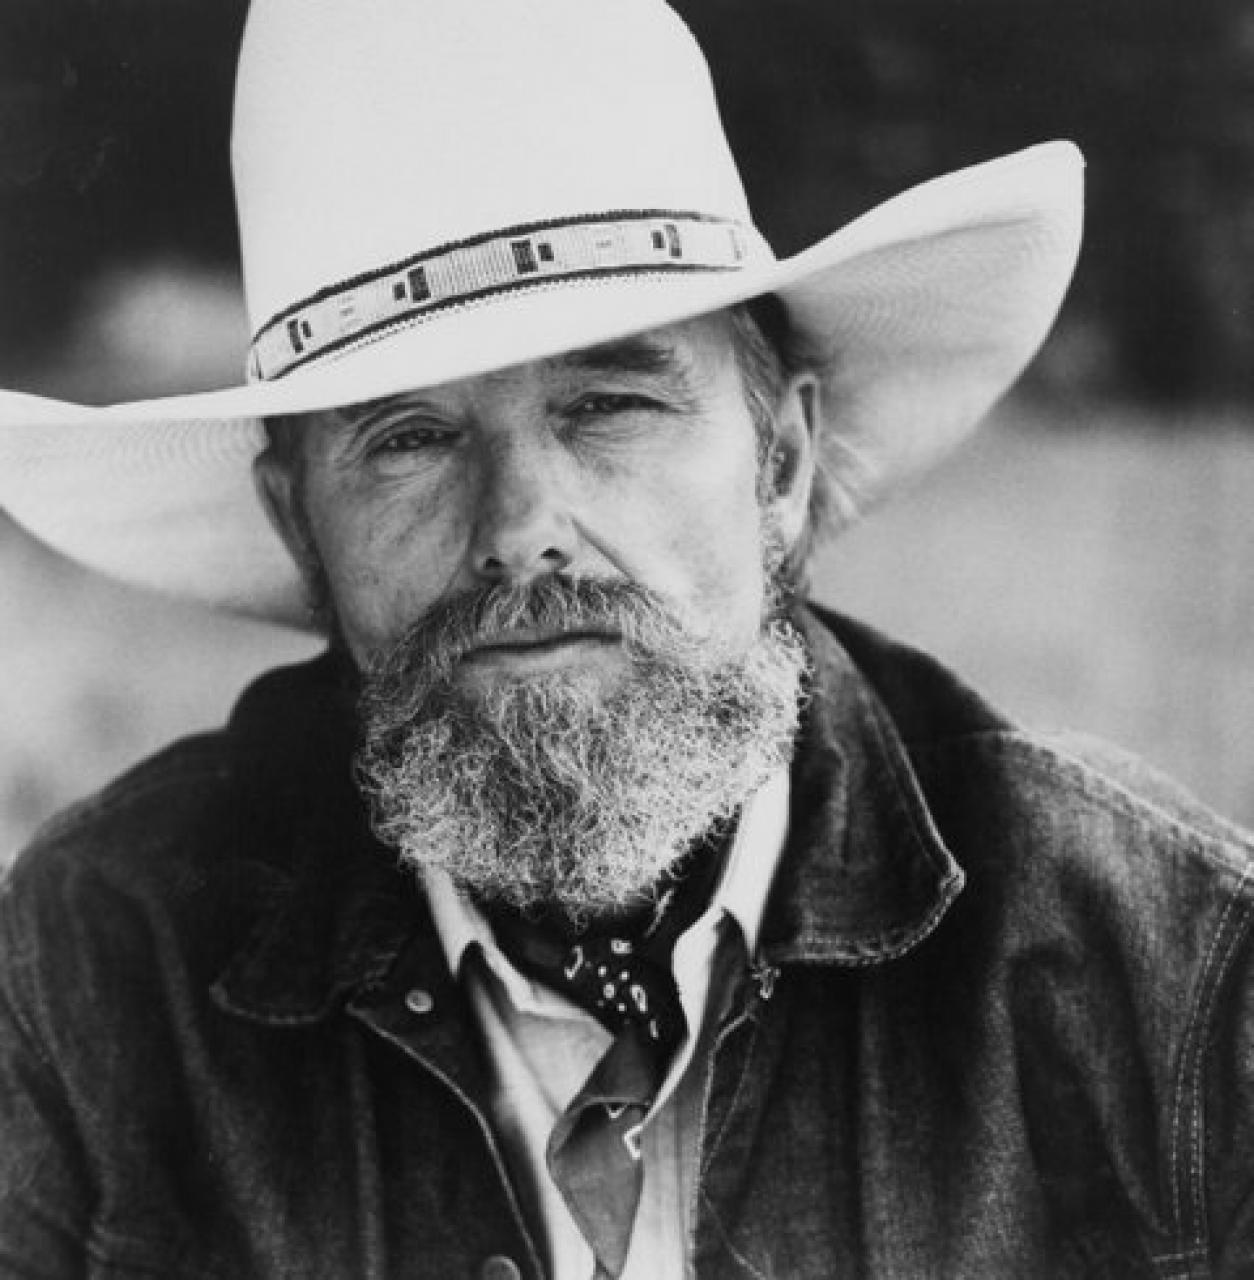 Portrait of Charlie Daniels